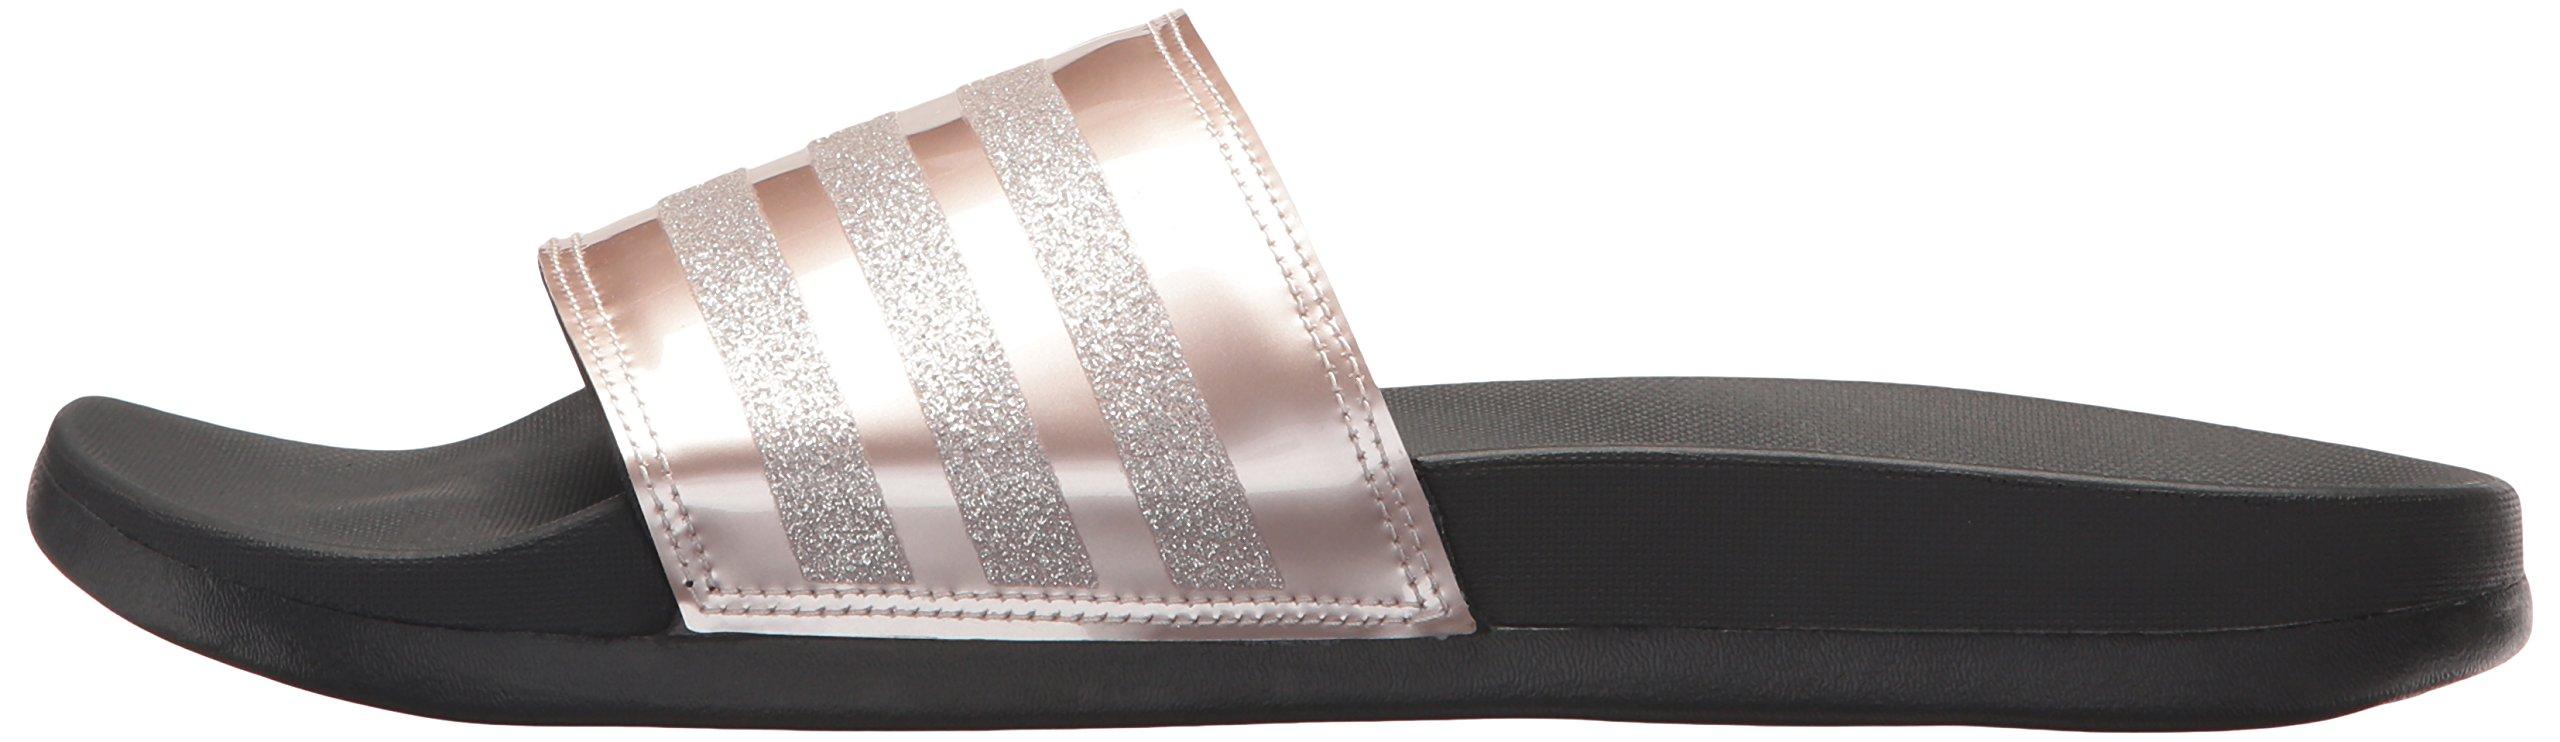 adidas Performance Women's Adilette CF+ Explorer W Sport Sandal, Vapour Grey Met, Vapour Grey Met.Fabric, Core Black, 9 M US by adidas (Image #5)